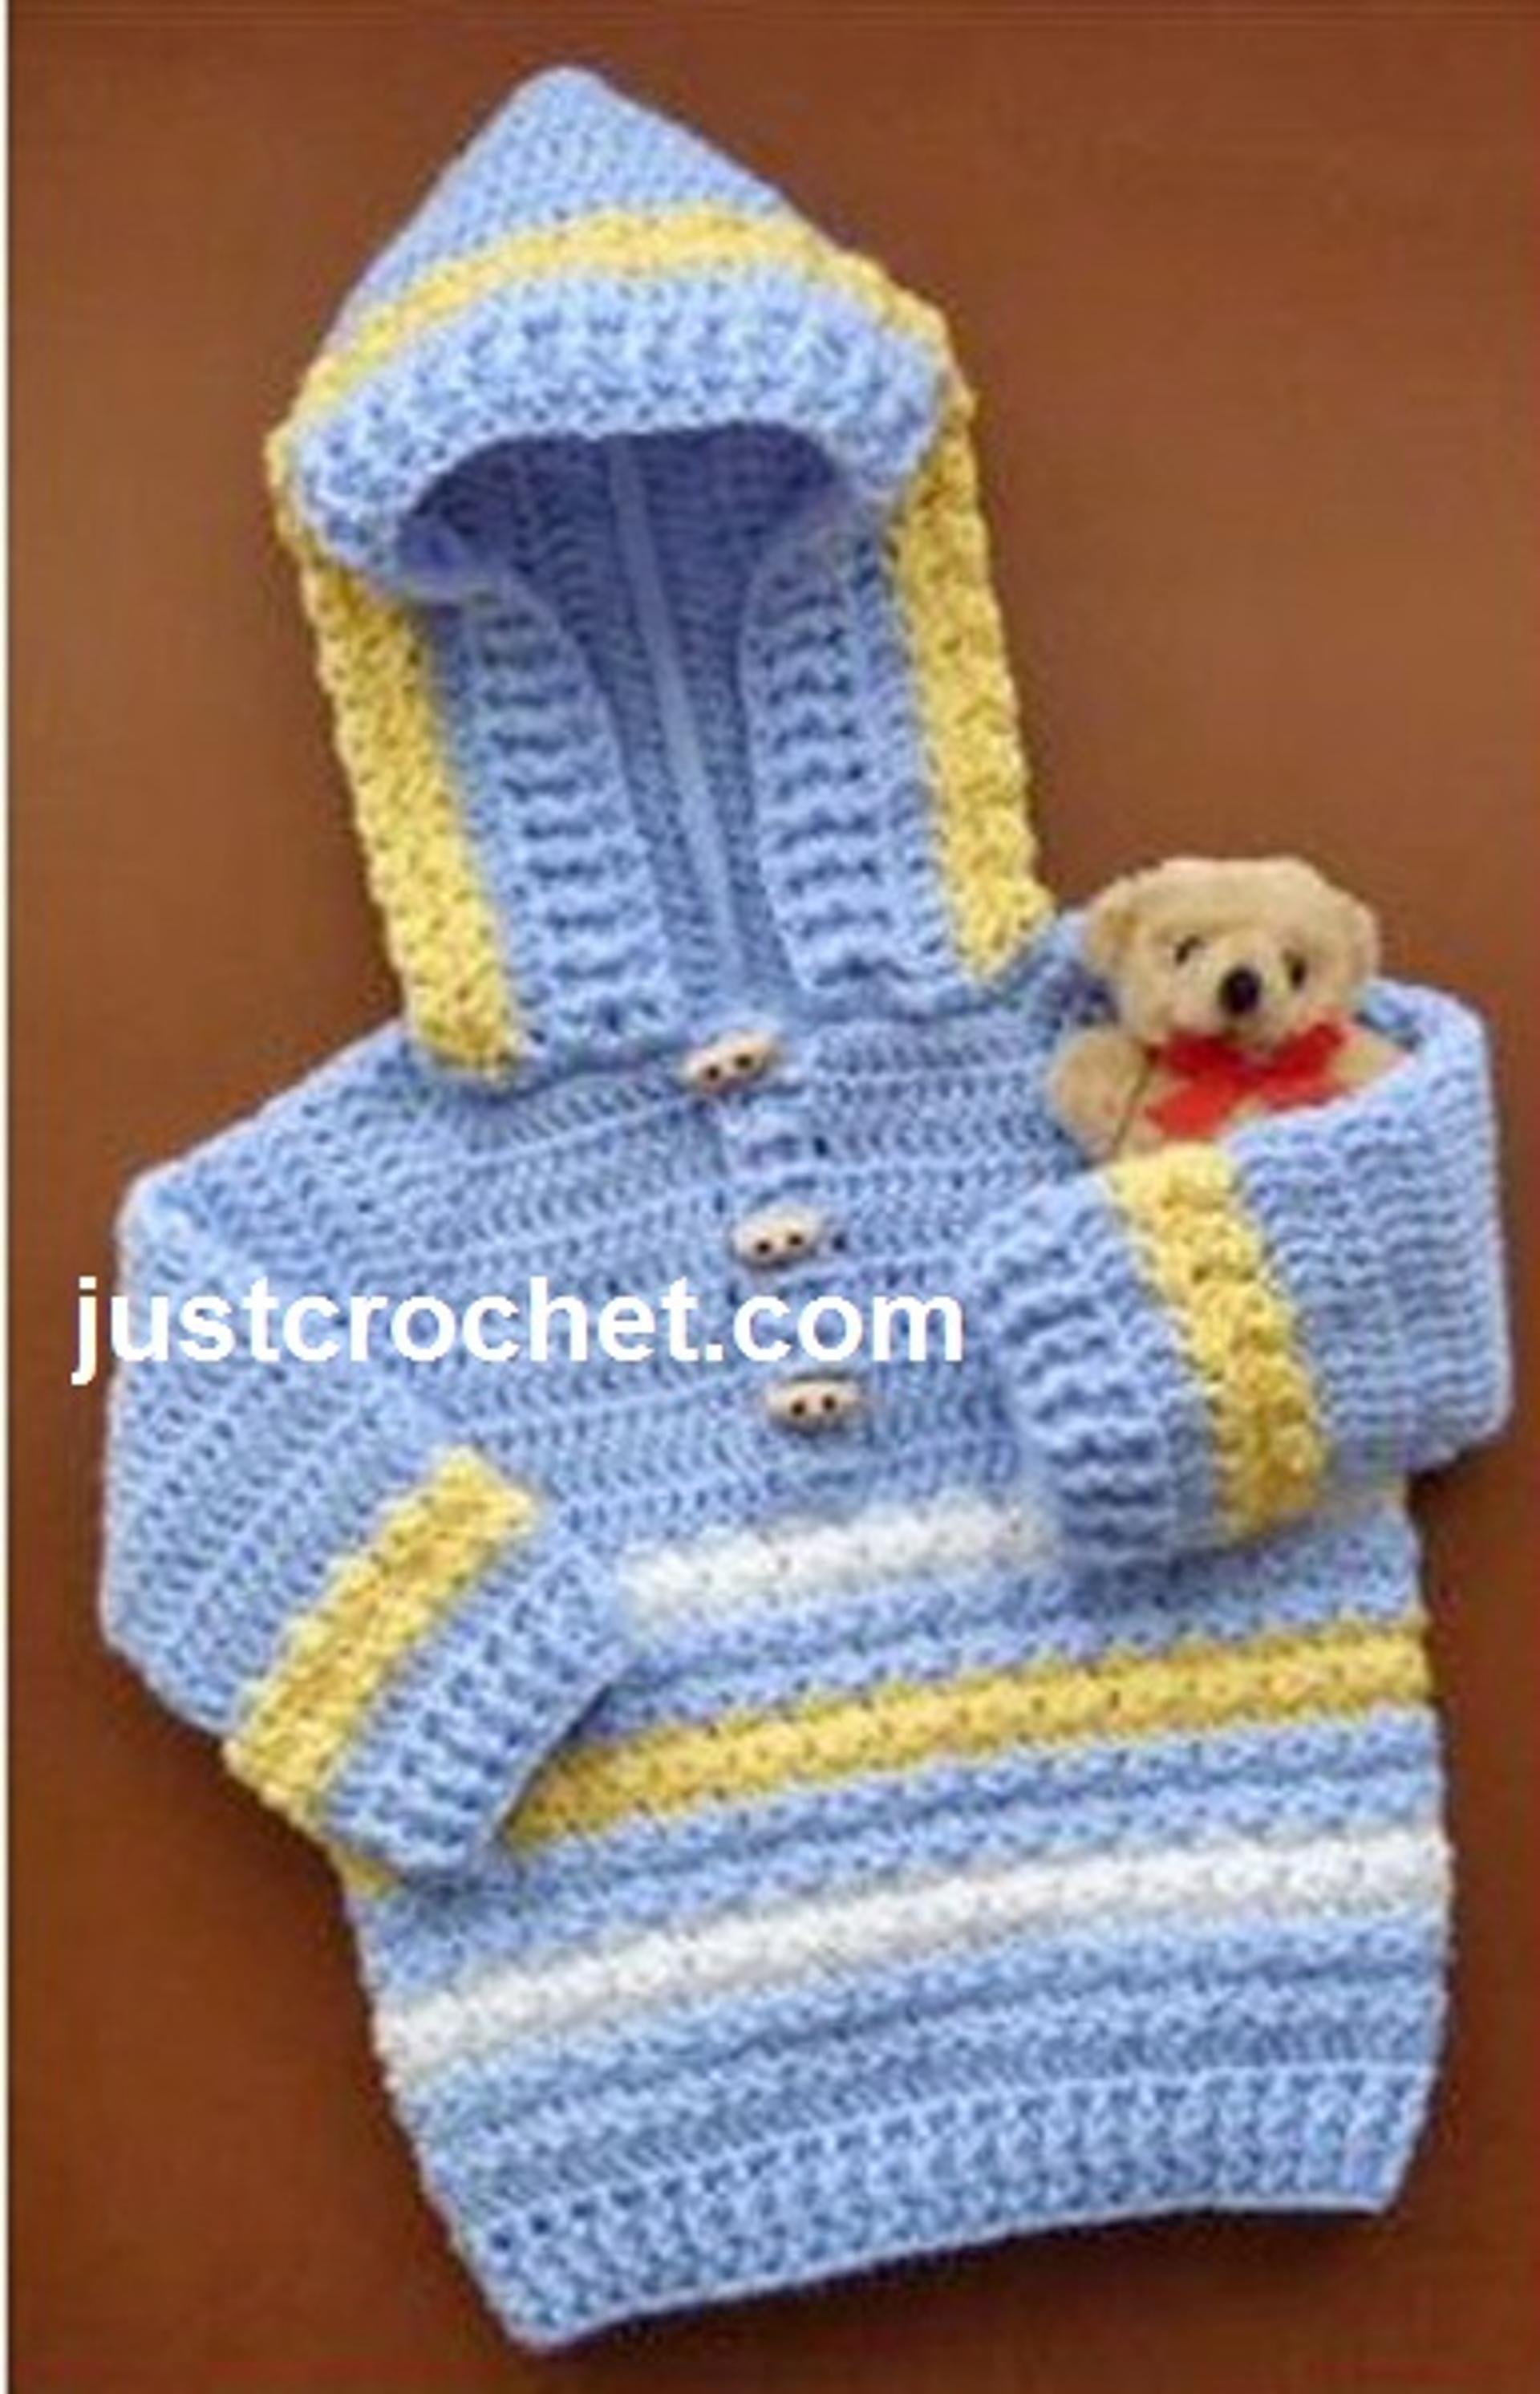 7bbfcd6105af fjc14-Hoodie Baby Crochet Pattern